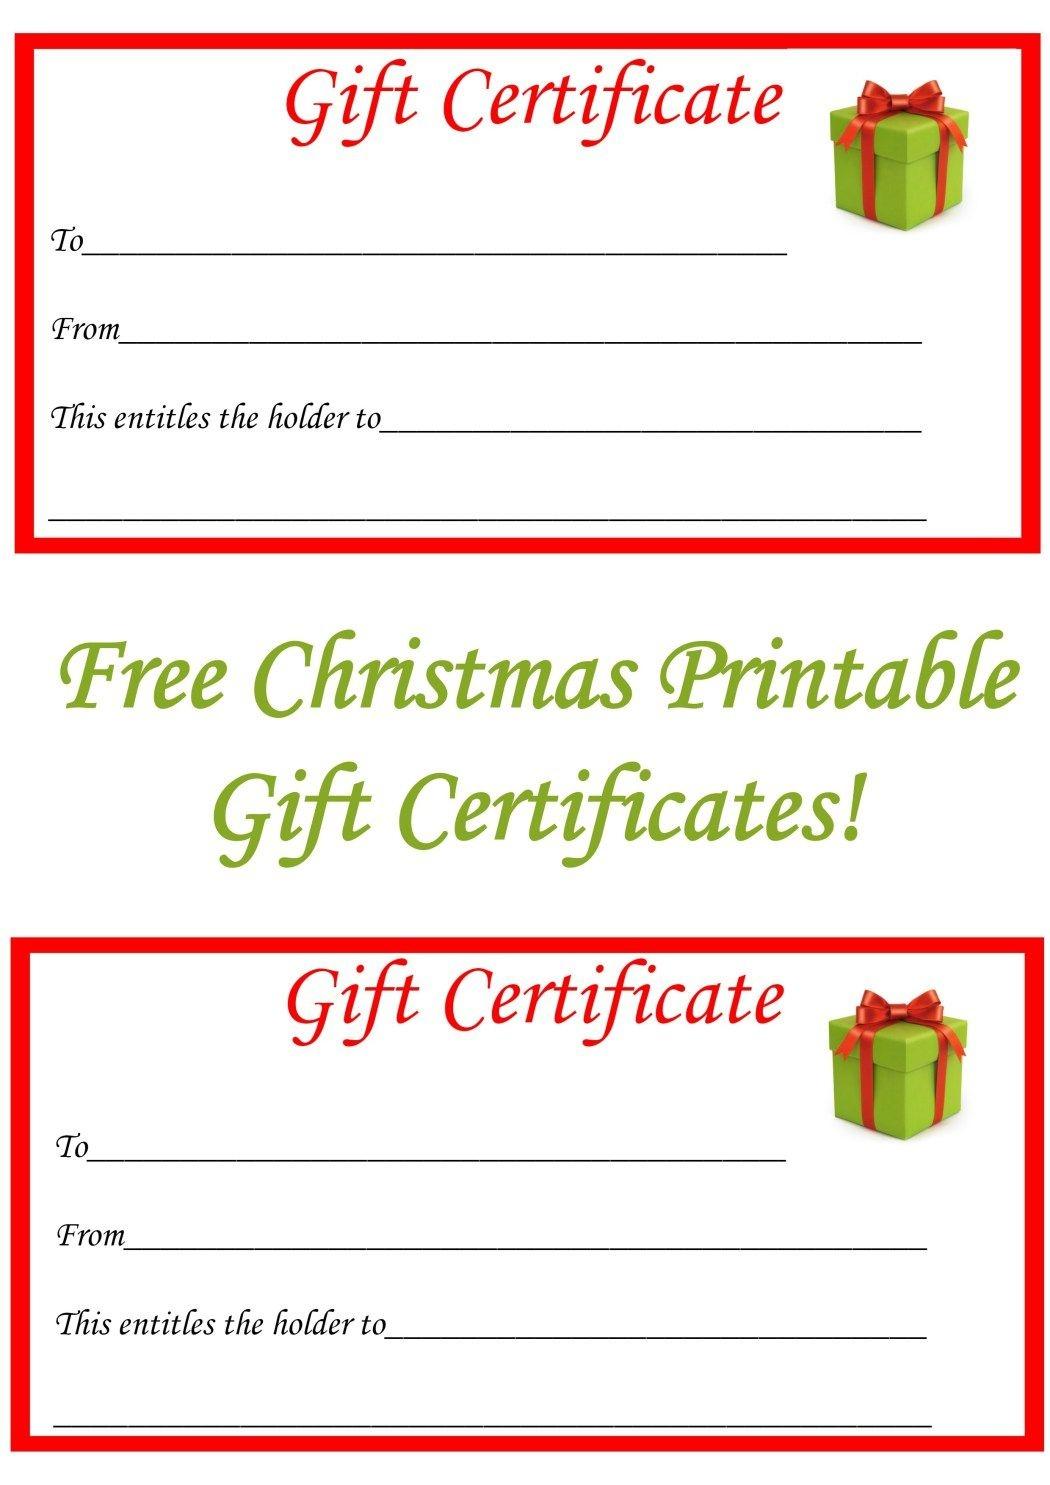 Free Christmas Printable Gift Certificates | Gift Ideas | Christmas - Free Printable Gift Cards